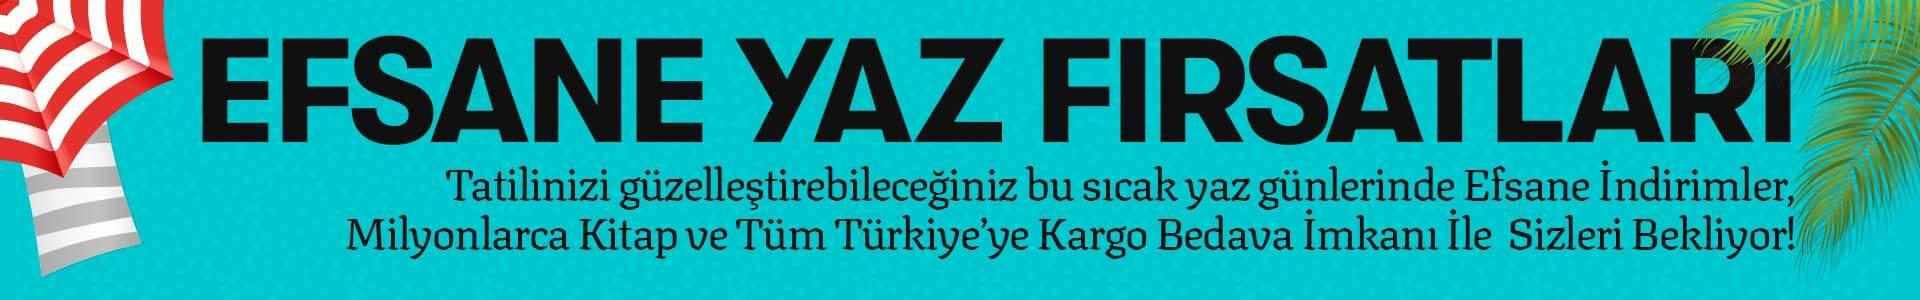 efsane-yaz-firsatlari-ust-banner.jpg (69 KB)